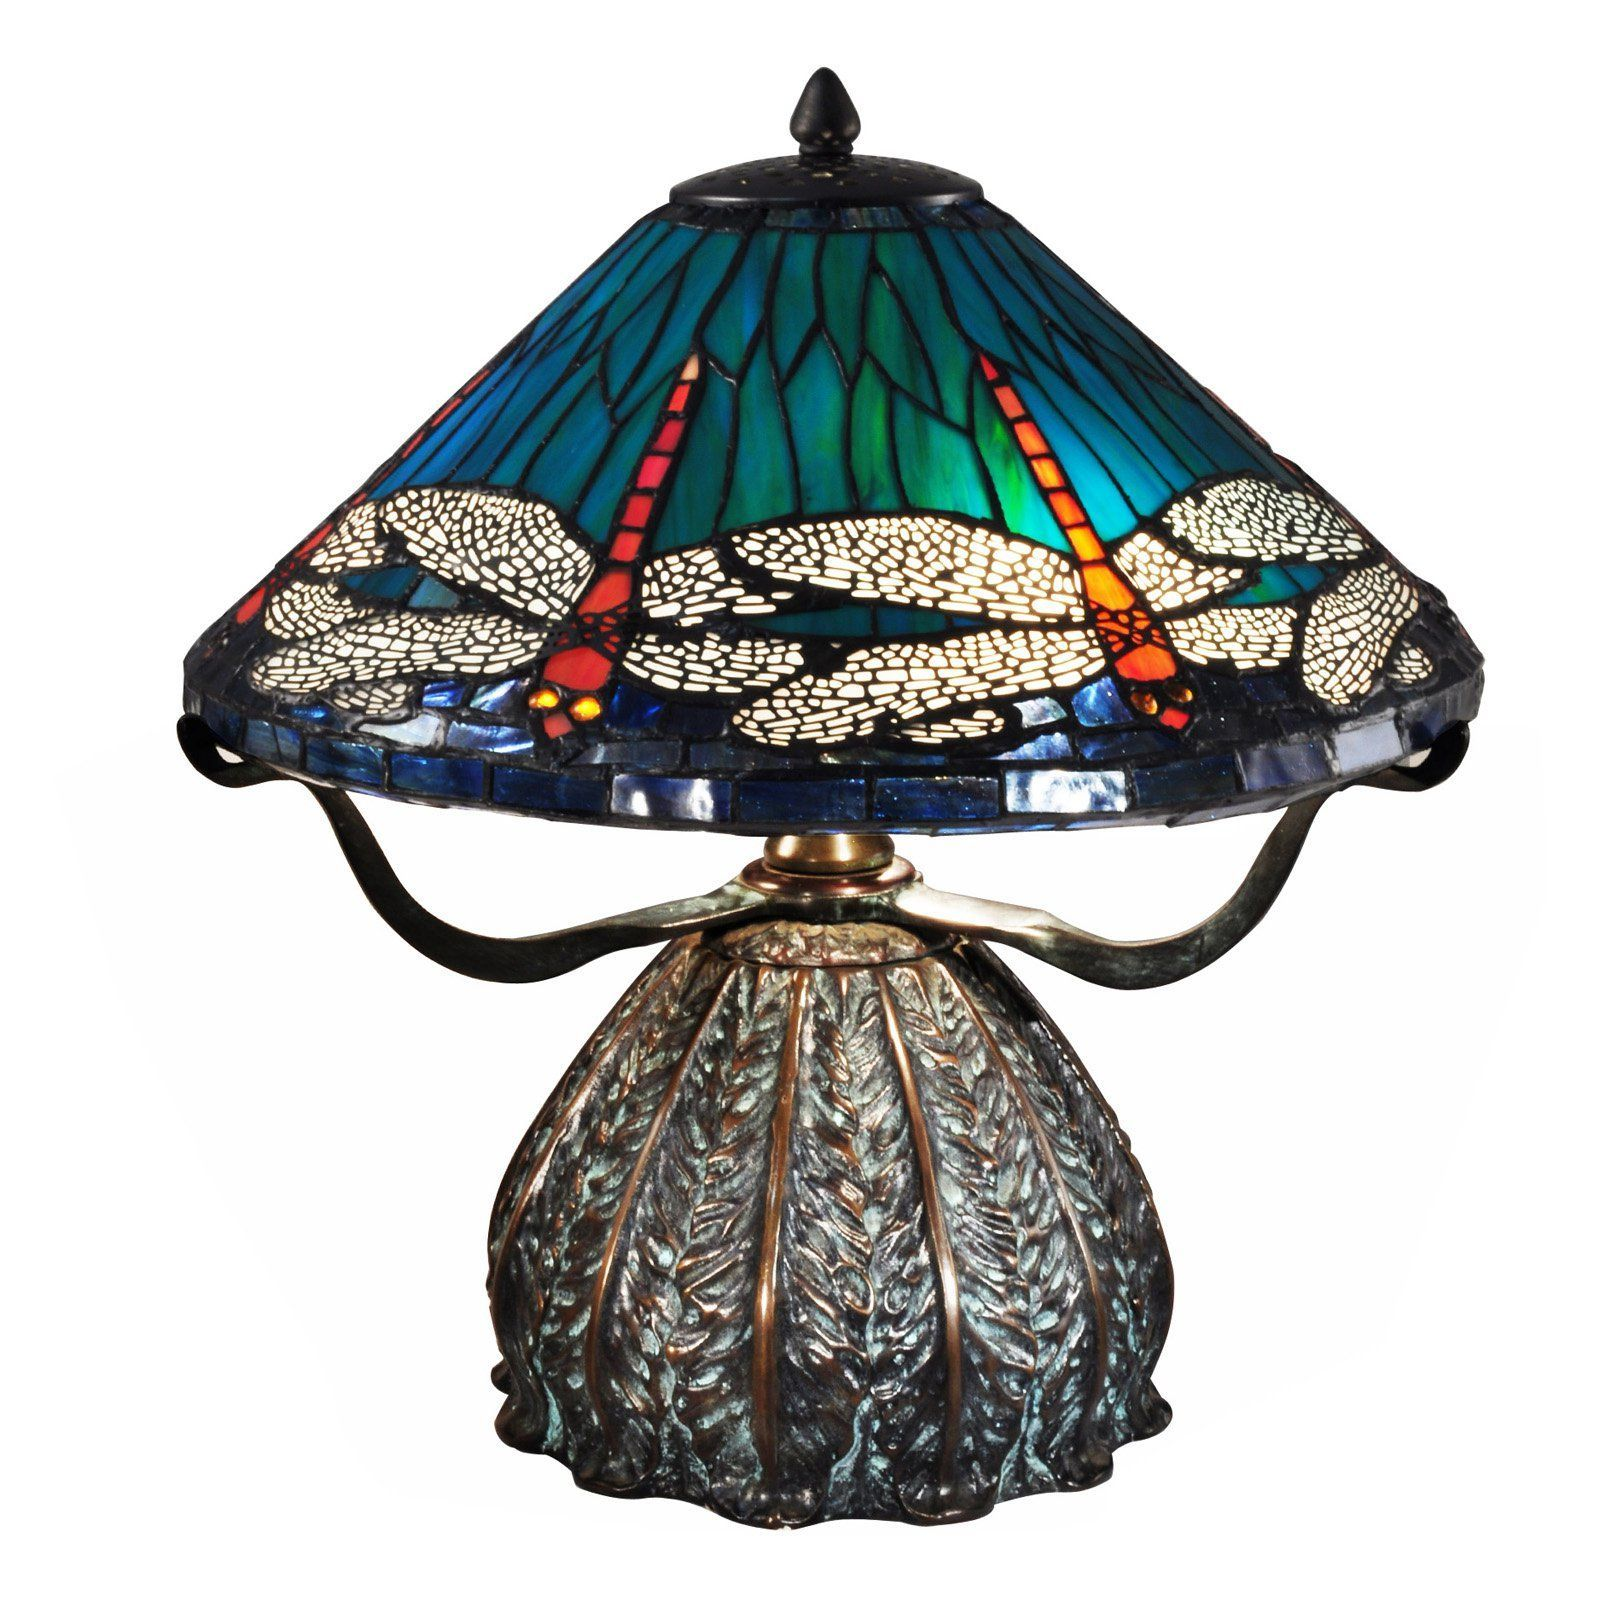 Dale Tiffany Dragonfly Trunk Table Lamp Tt15106 Table Lamp Vintage Table Lamp Vintage Style Table Lamps